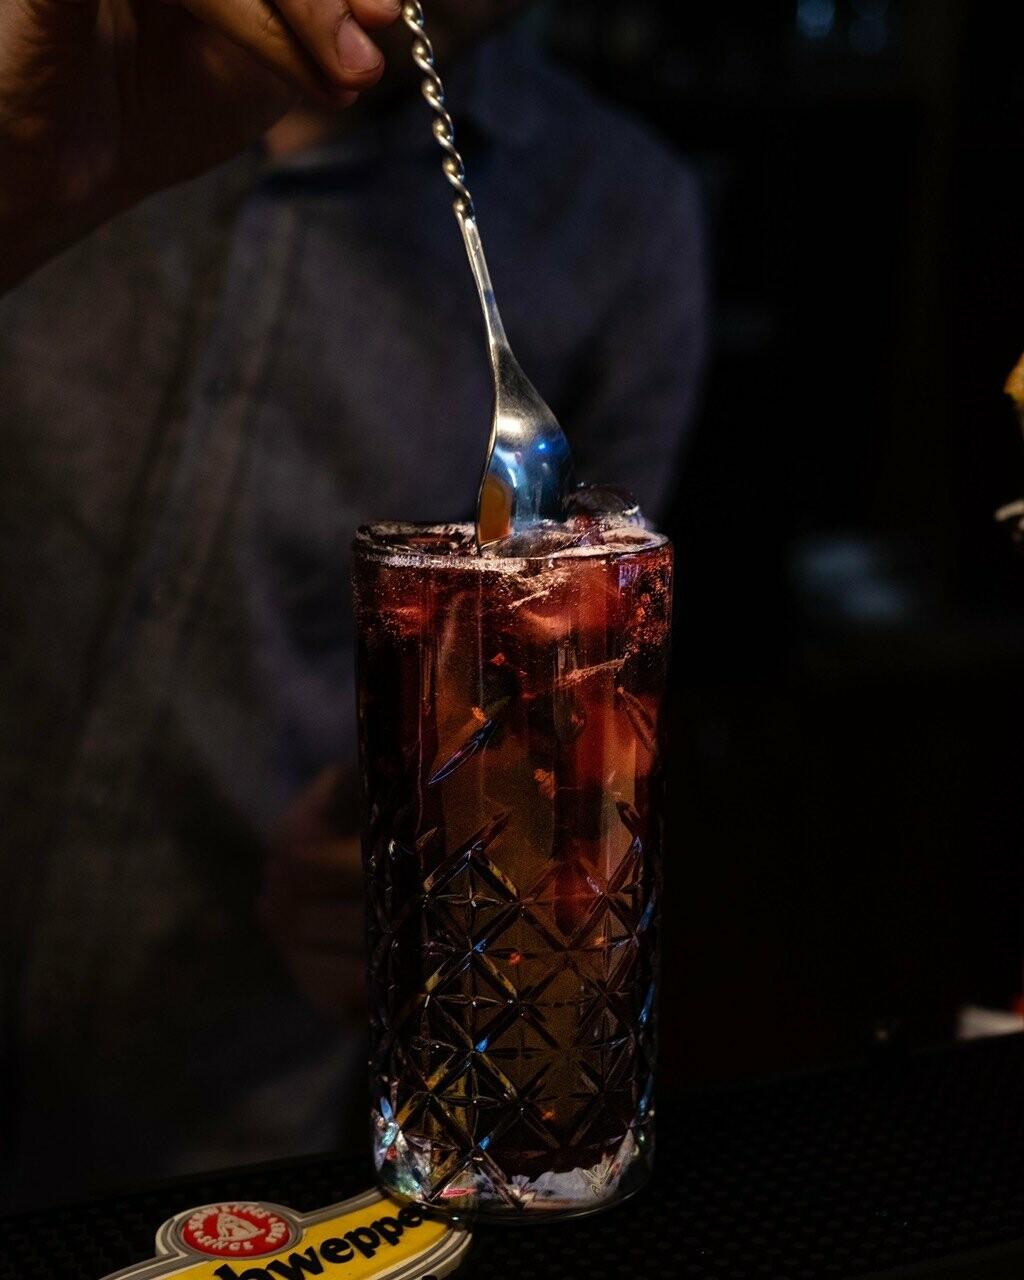 Hookah Blast Lounge Bar в Запорожье, Лаунж Бар на Бульваре Шевченко в Запорожье, кафе-бар кальянная в Запорожье, Паб в Запорожье, Пивбар в Запорожье, Разливное пиво на БШ в Запорожье